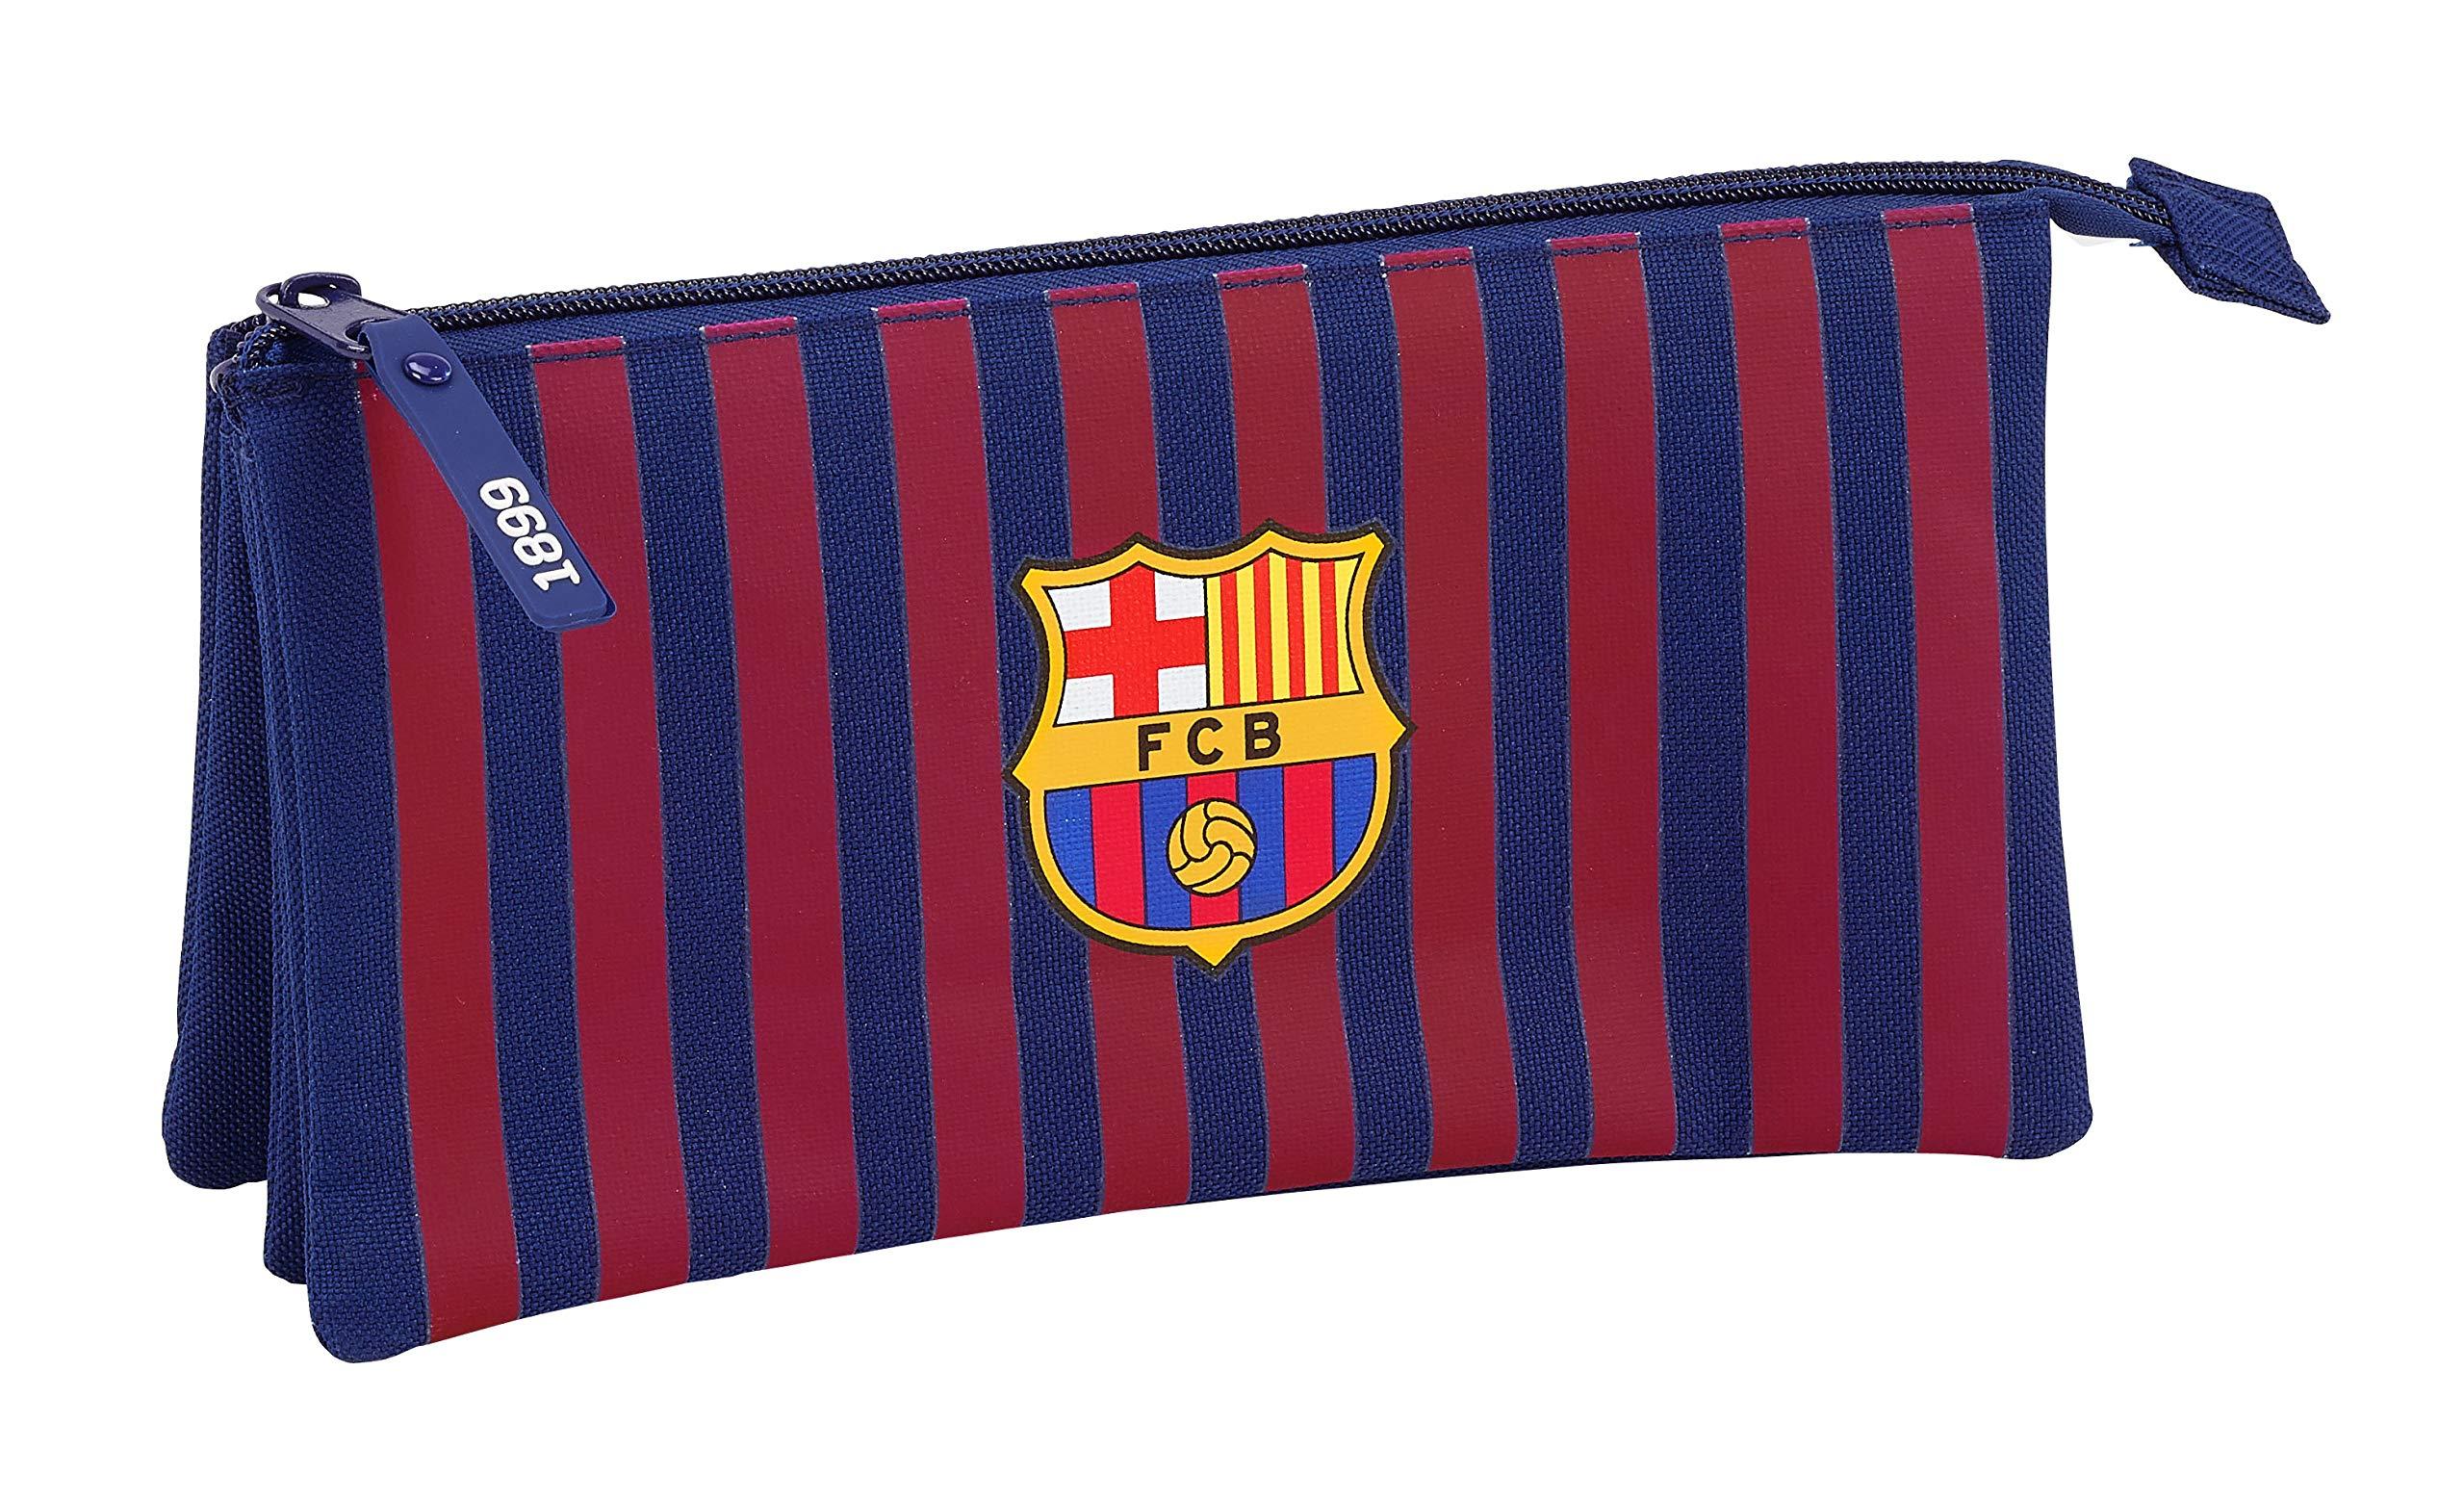 FC Barcelona 811829744 2018 Estuches 22 cm, Azul